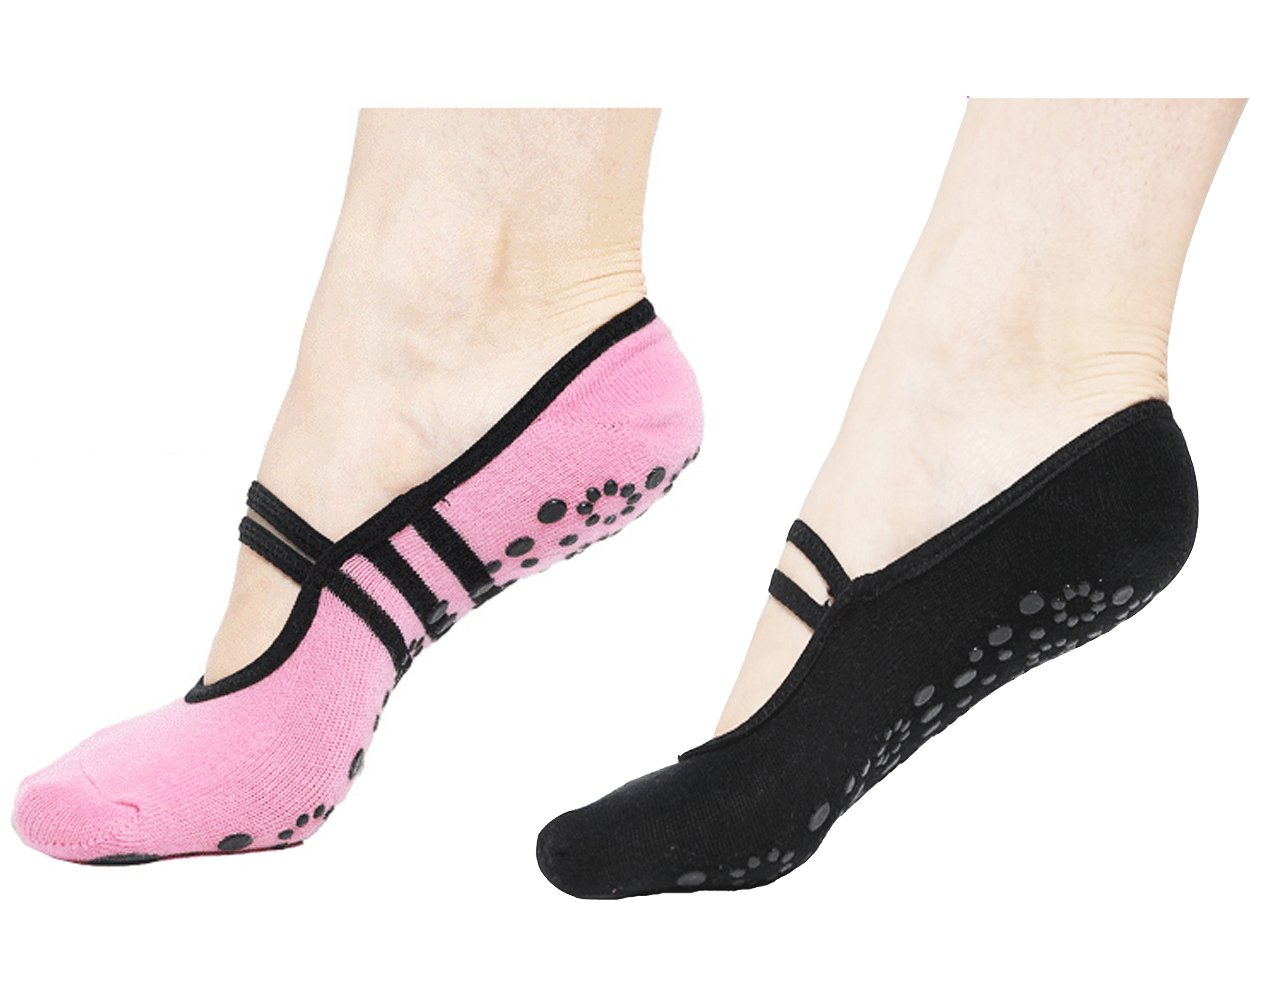 CBValley 2 Paar Rutschfeste Socken Yoga Pilates Socken Fitness/Tanz/Ballett Socken für Frauen Größe UK 2,5-7 / EU 35-40 5-7 / EU 35-40 (Schwarz+Rosa)